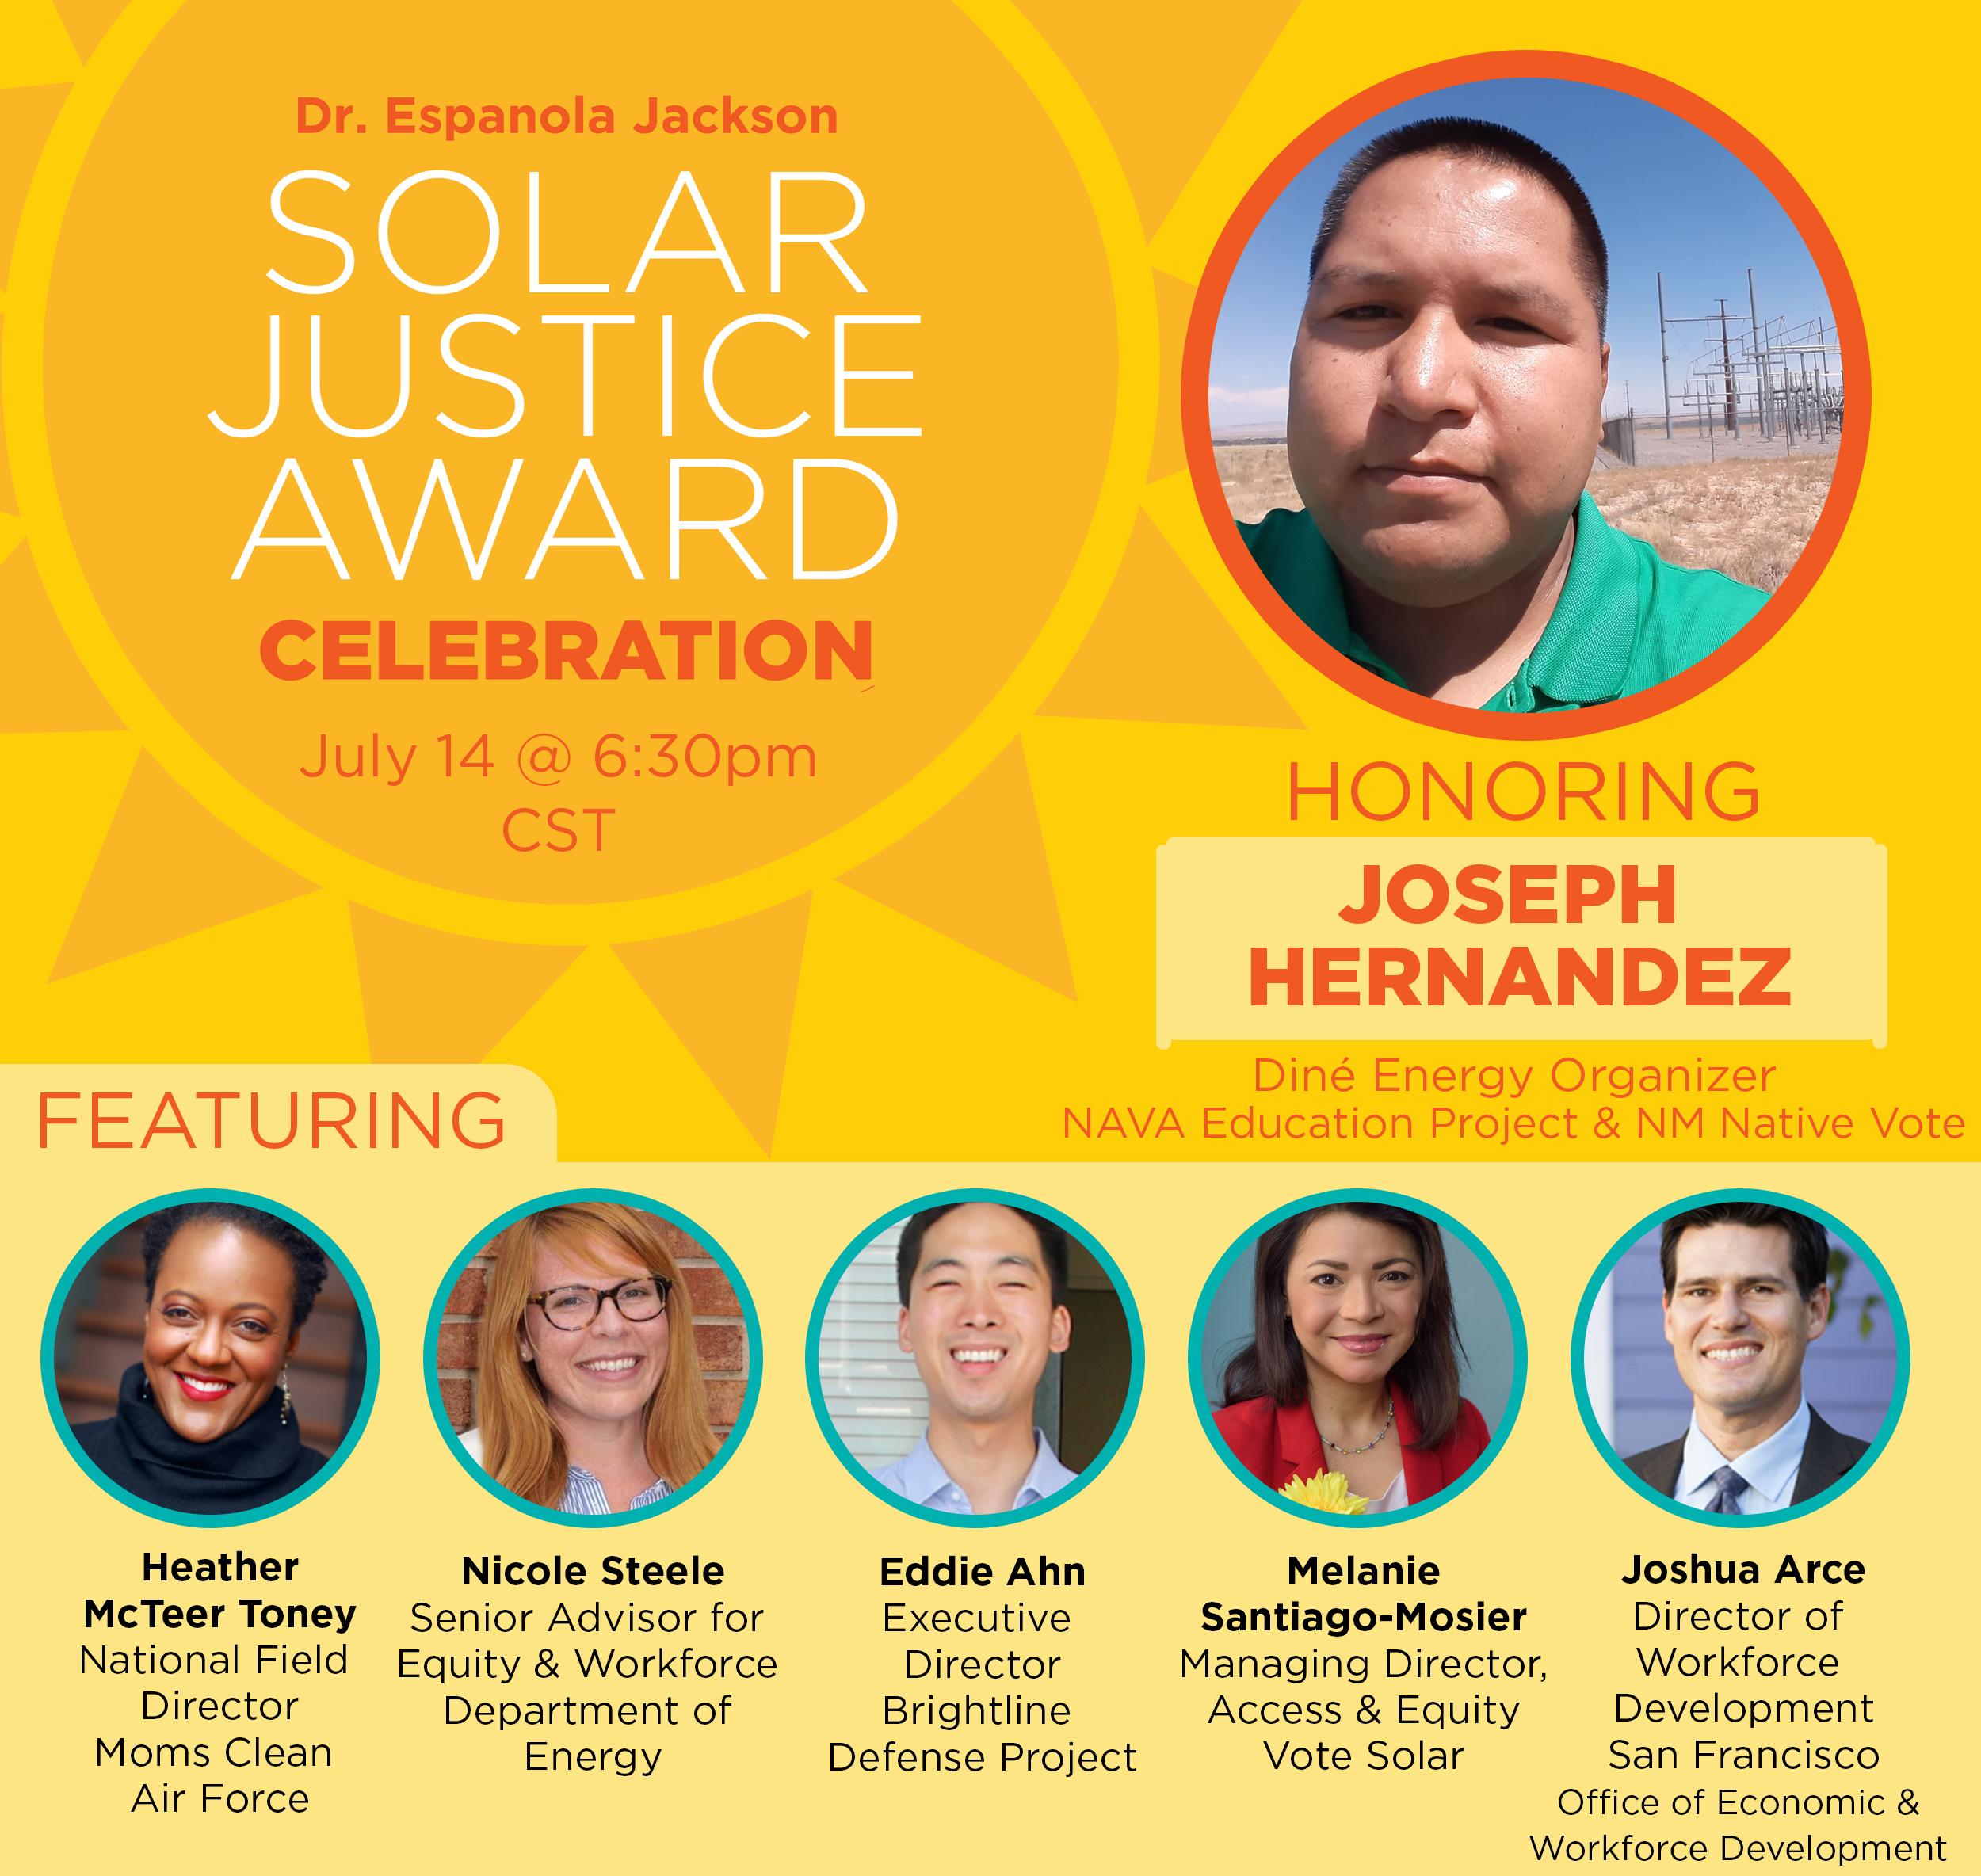 Solar Justice Award: Honoring Joseph Hernandez